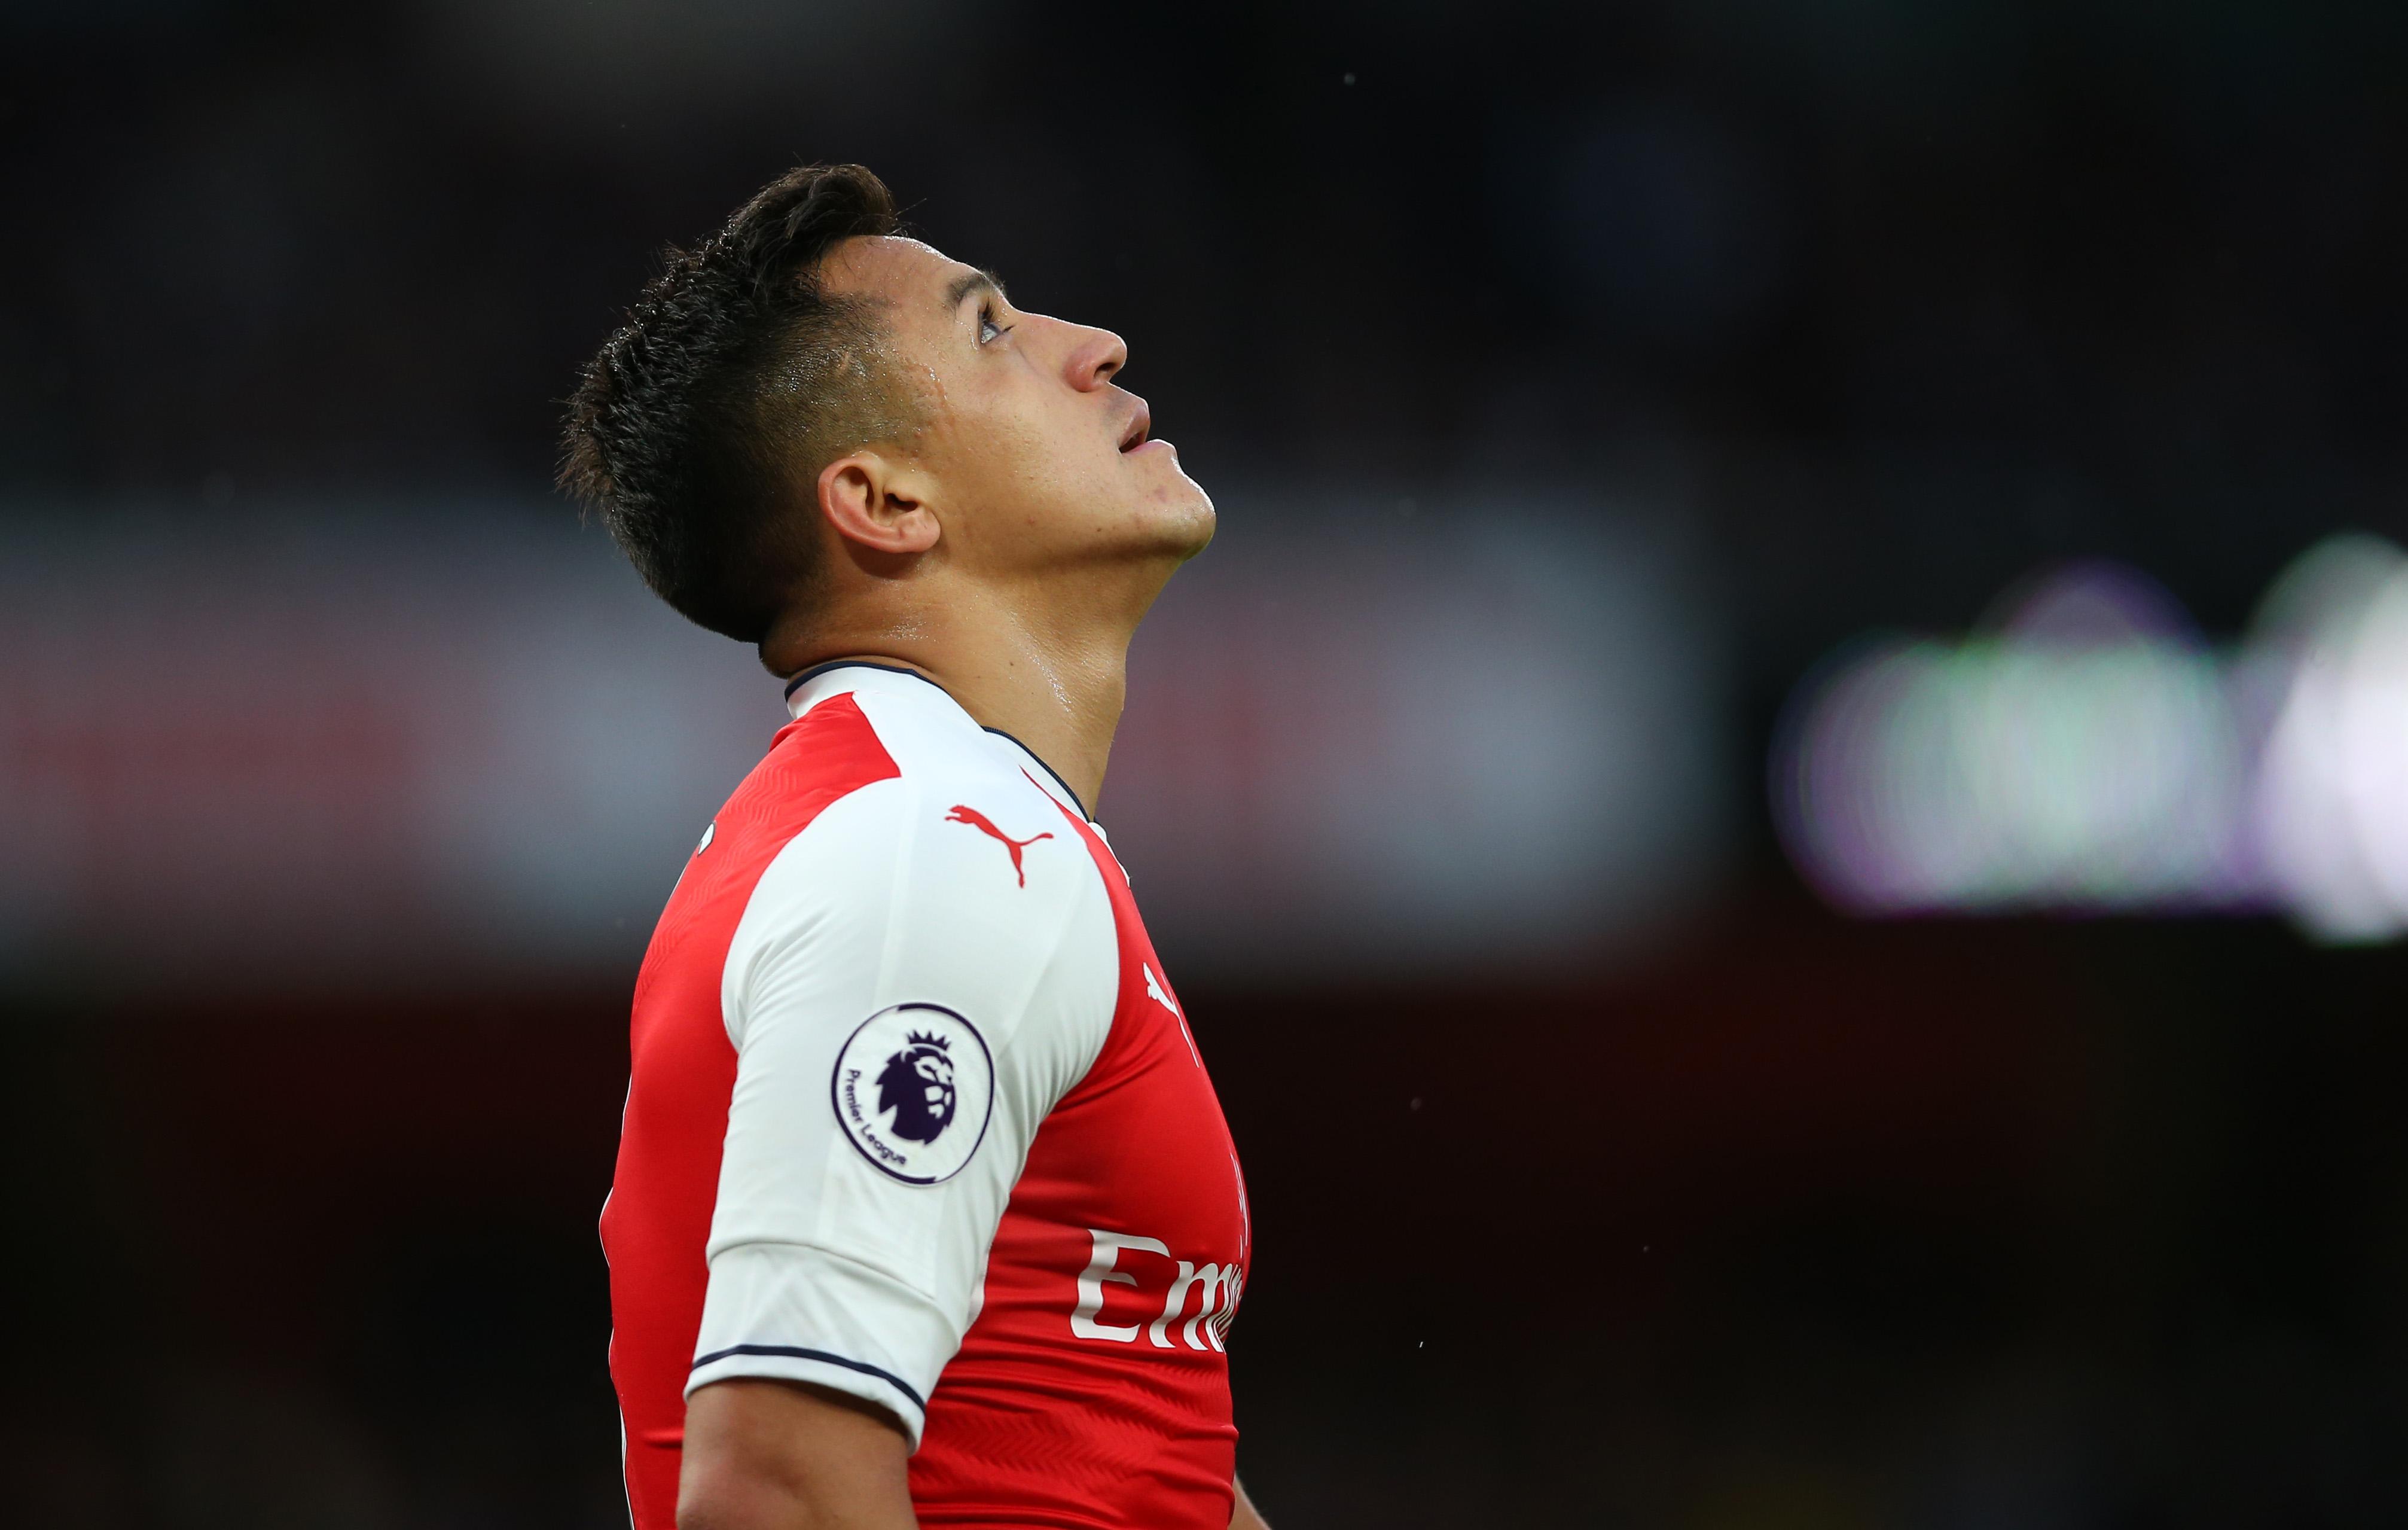 Arsenal 3 reasons to fear Alexis Sanchez departure rumours